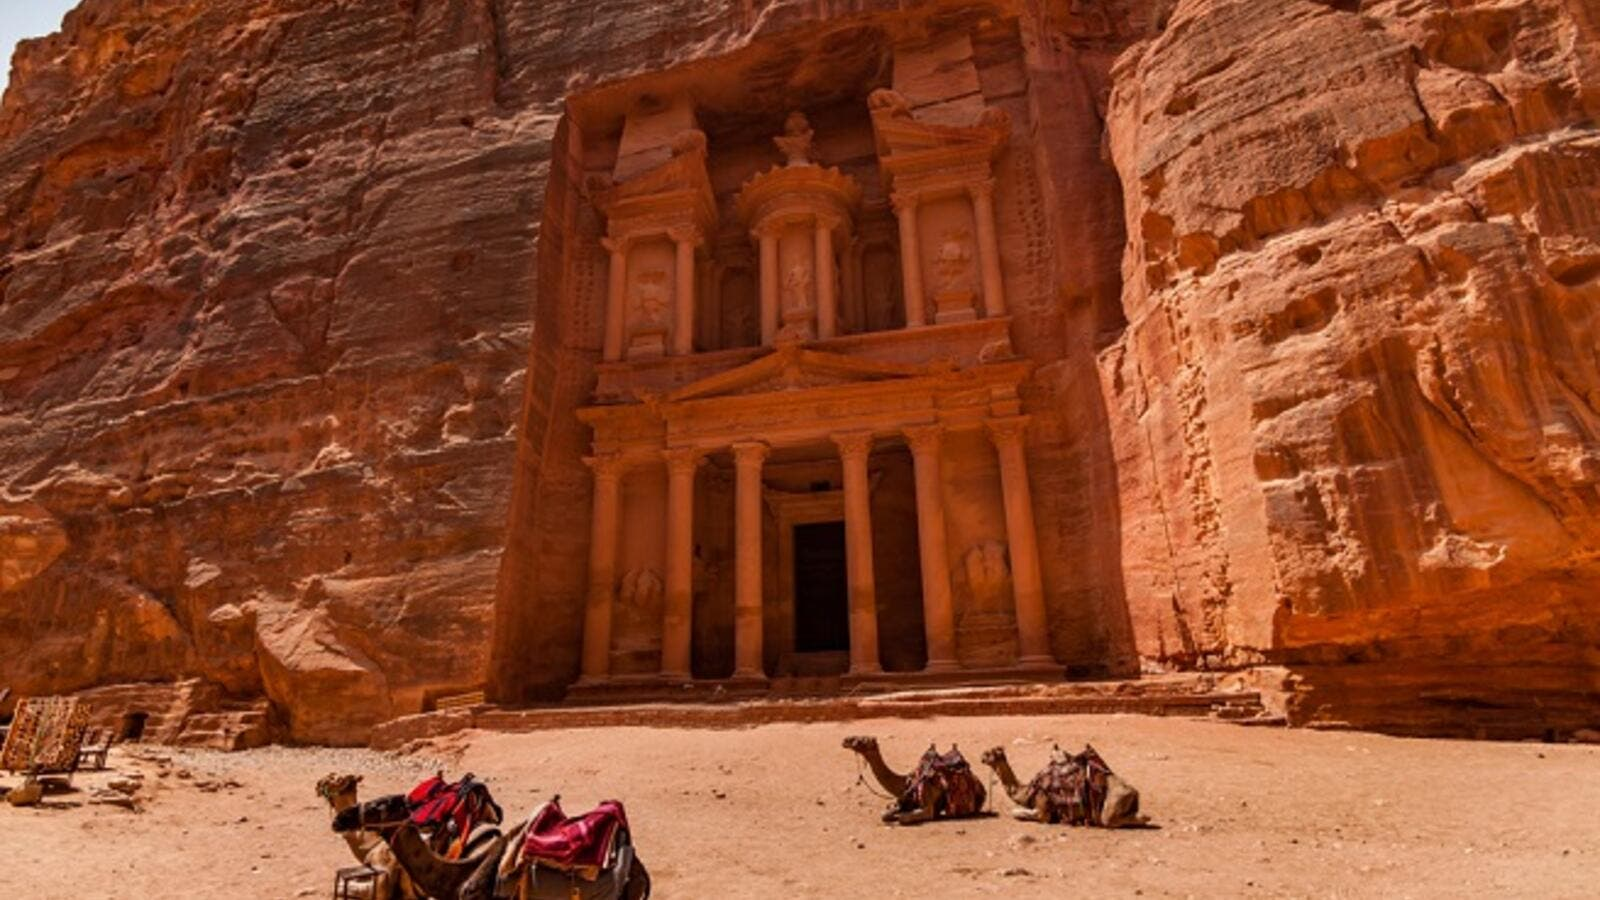 Jordan: Number of Petra Visitors Rises Considerably in February | Al